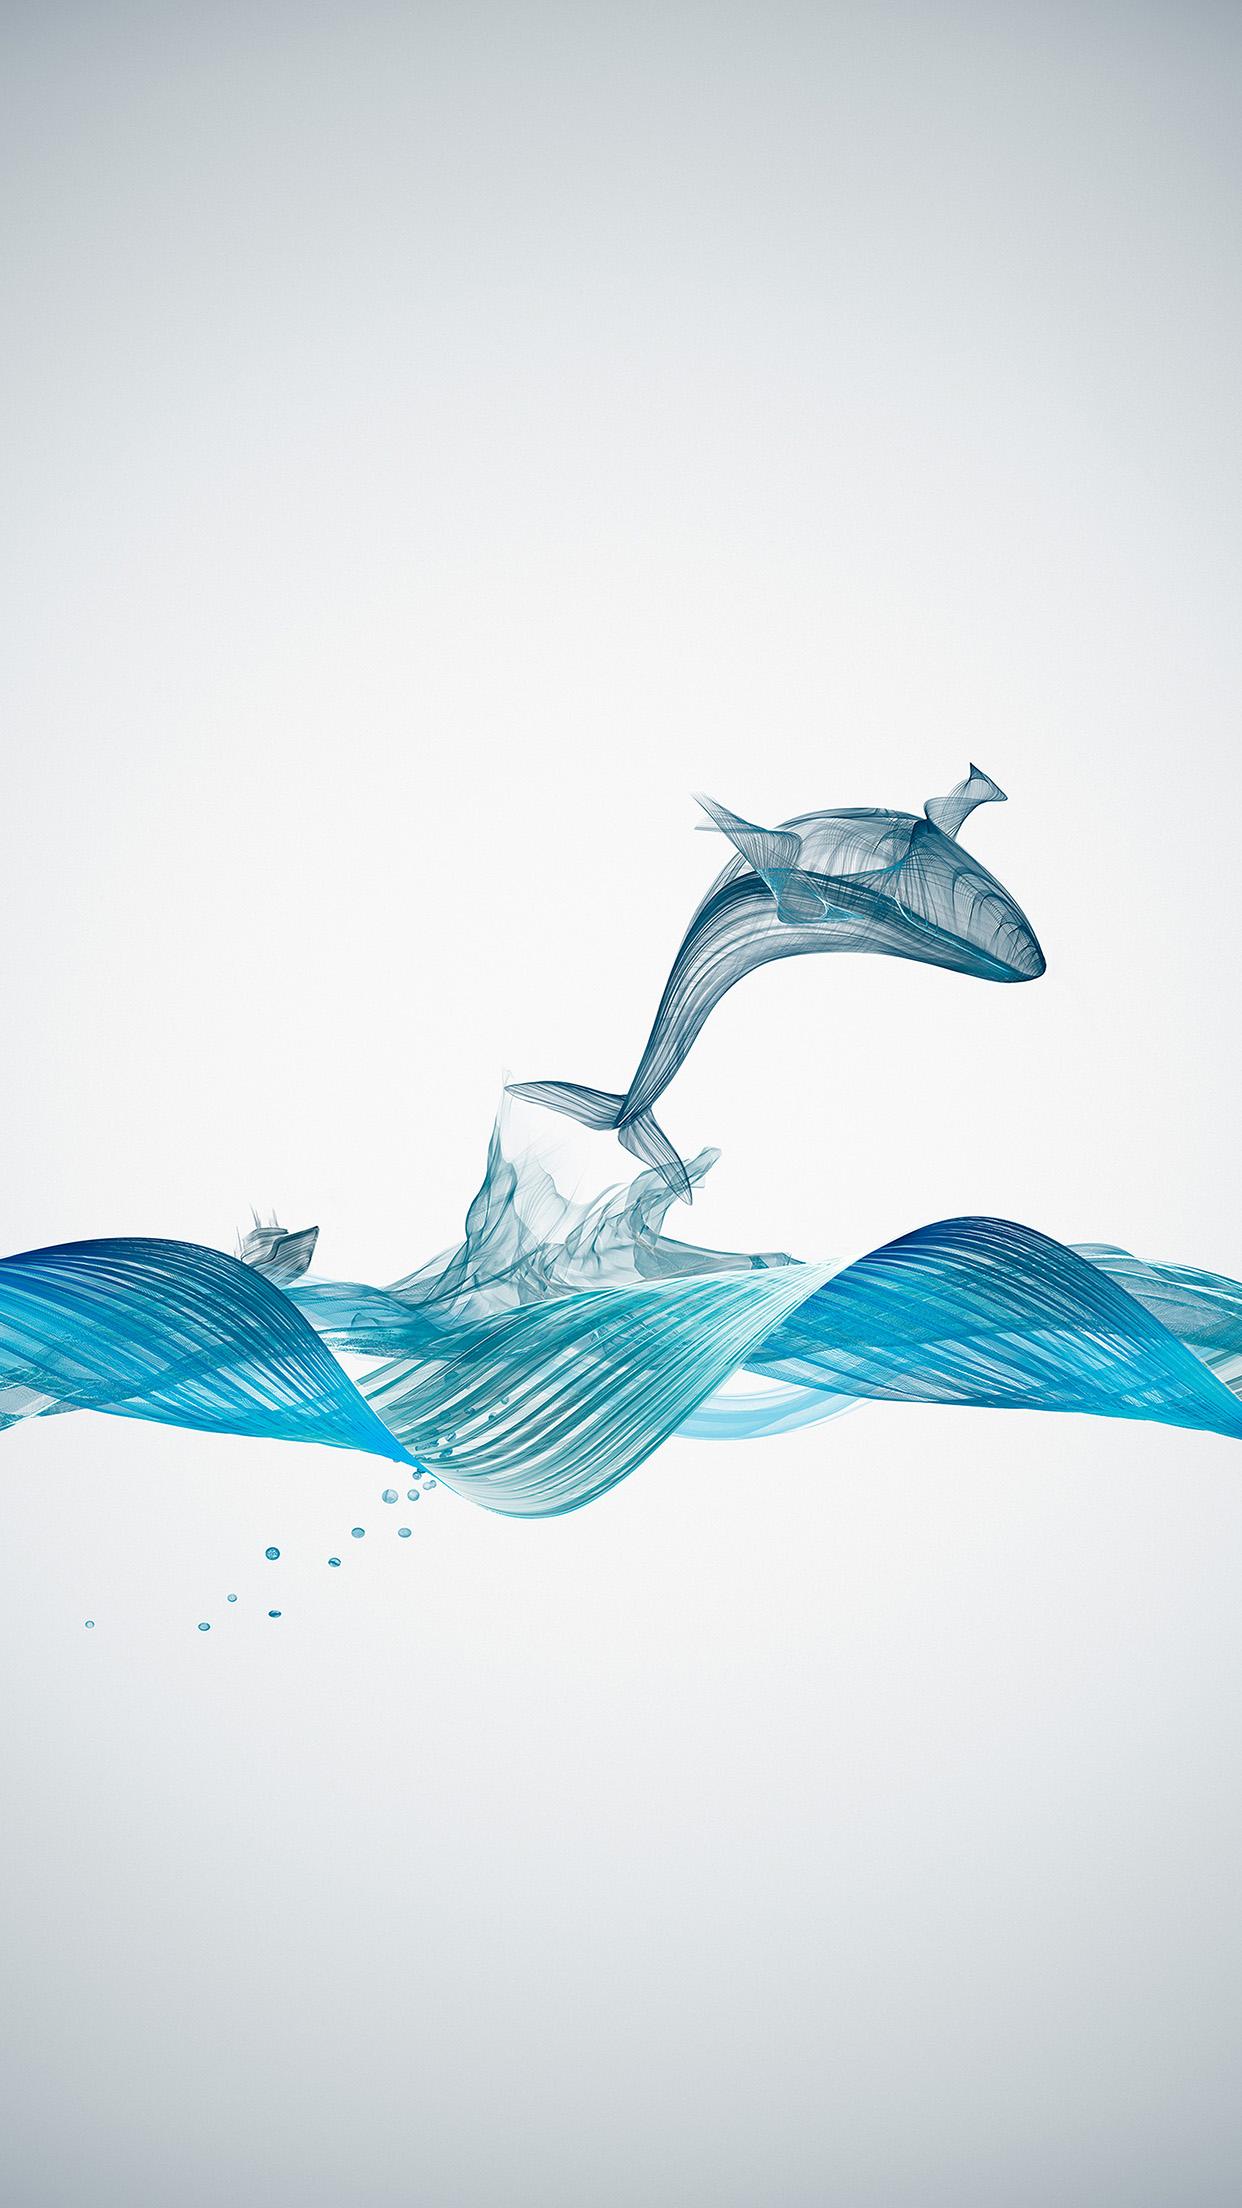 Bd84 Fishing Boat Whale Wave Line Art Illustration Animal